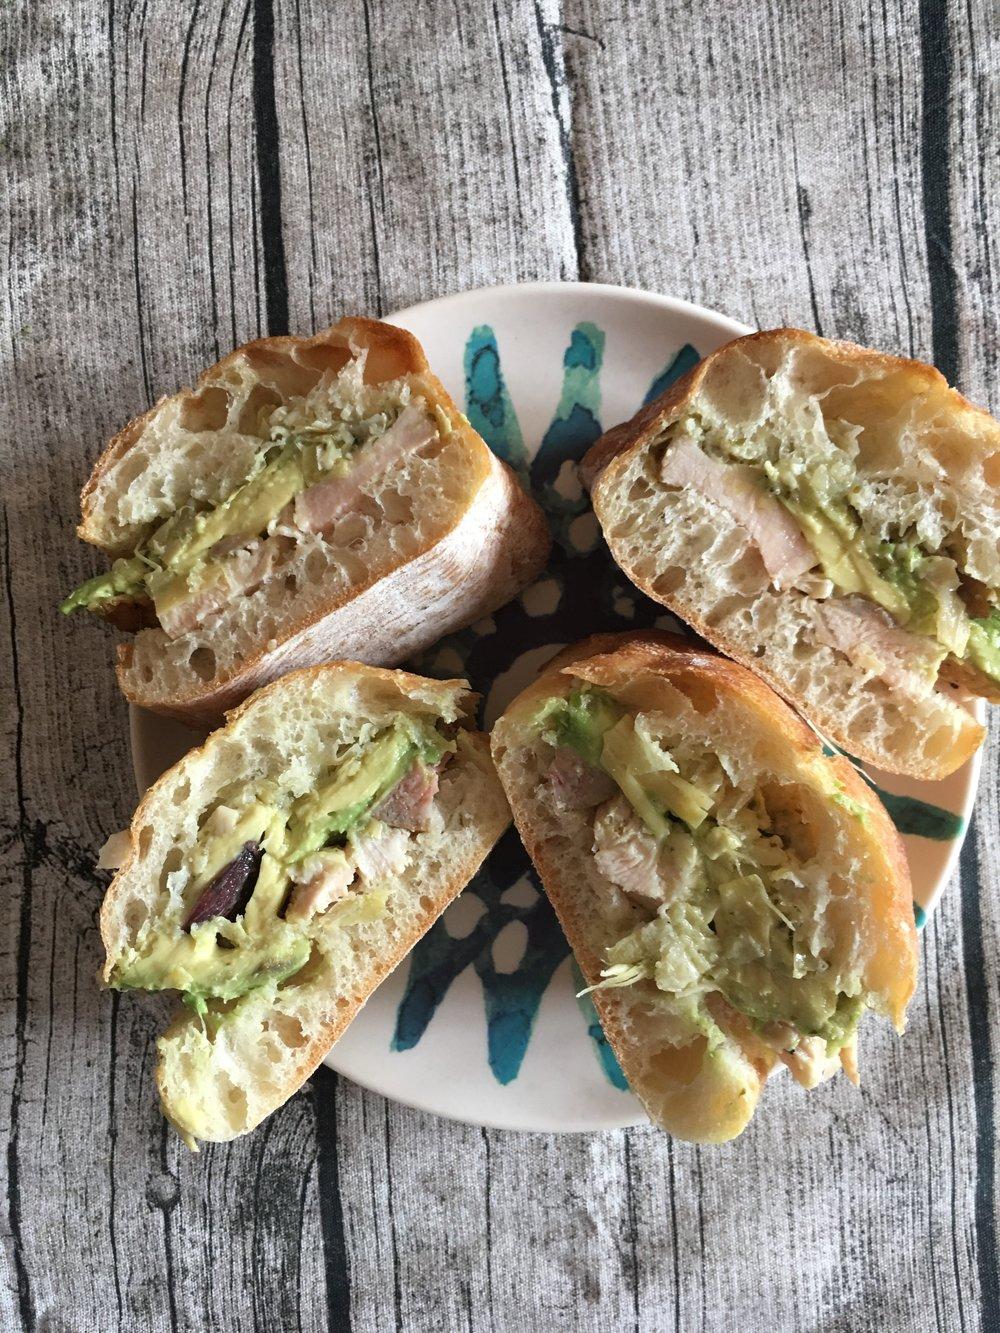 = Perfect Sandwich